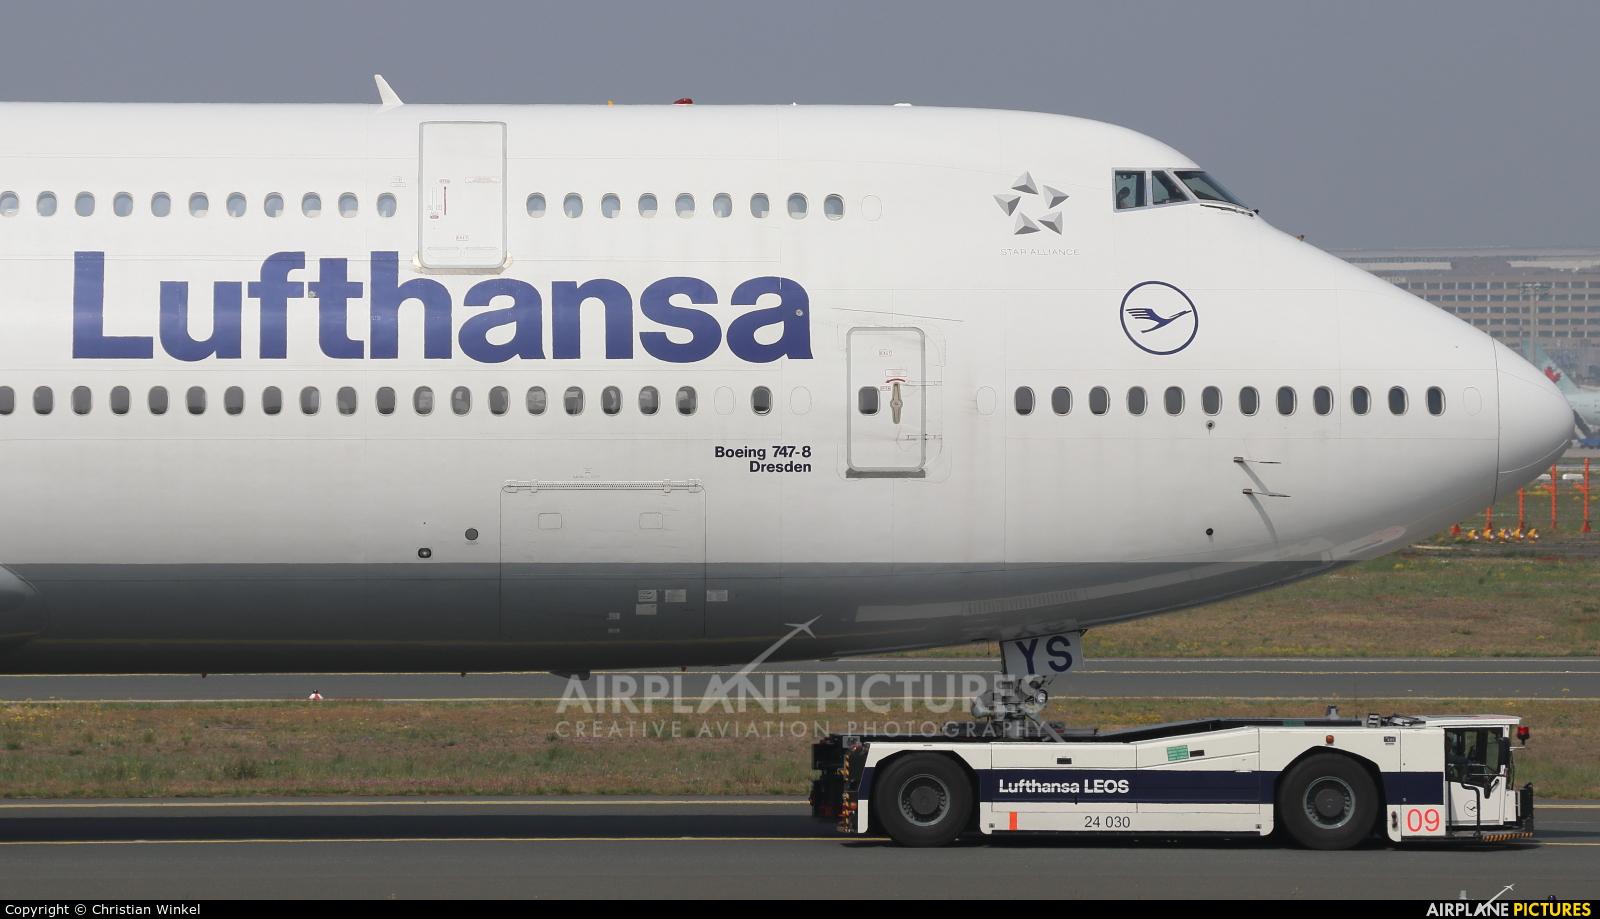 Lufthansa D-ABYS aircraft at Frankfurt